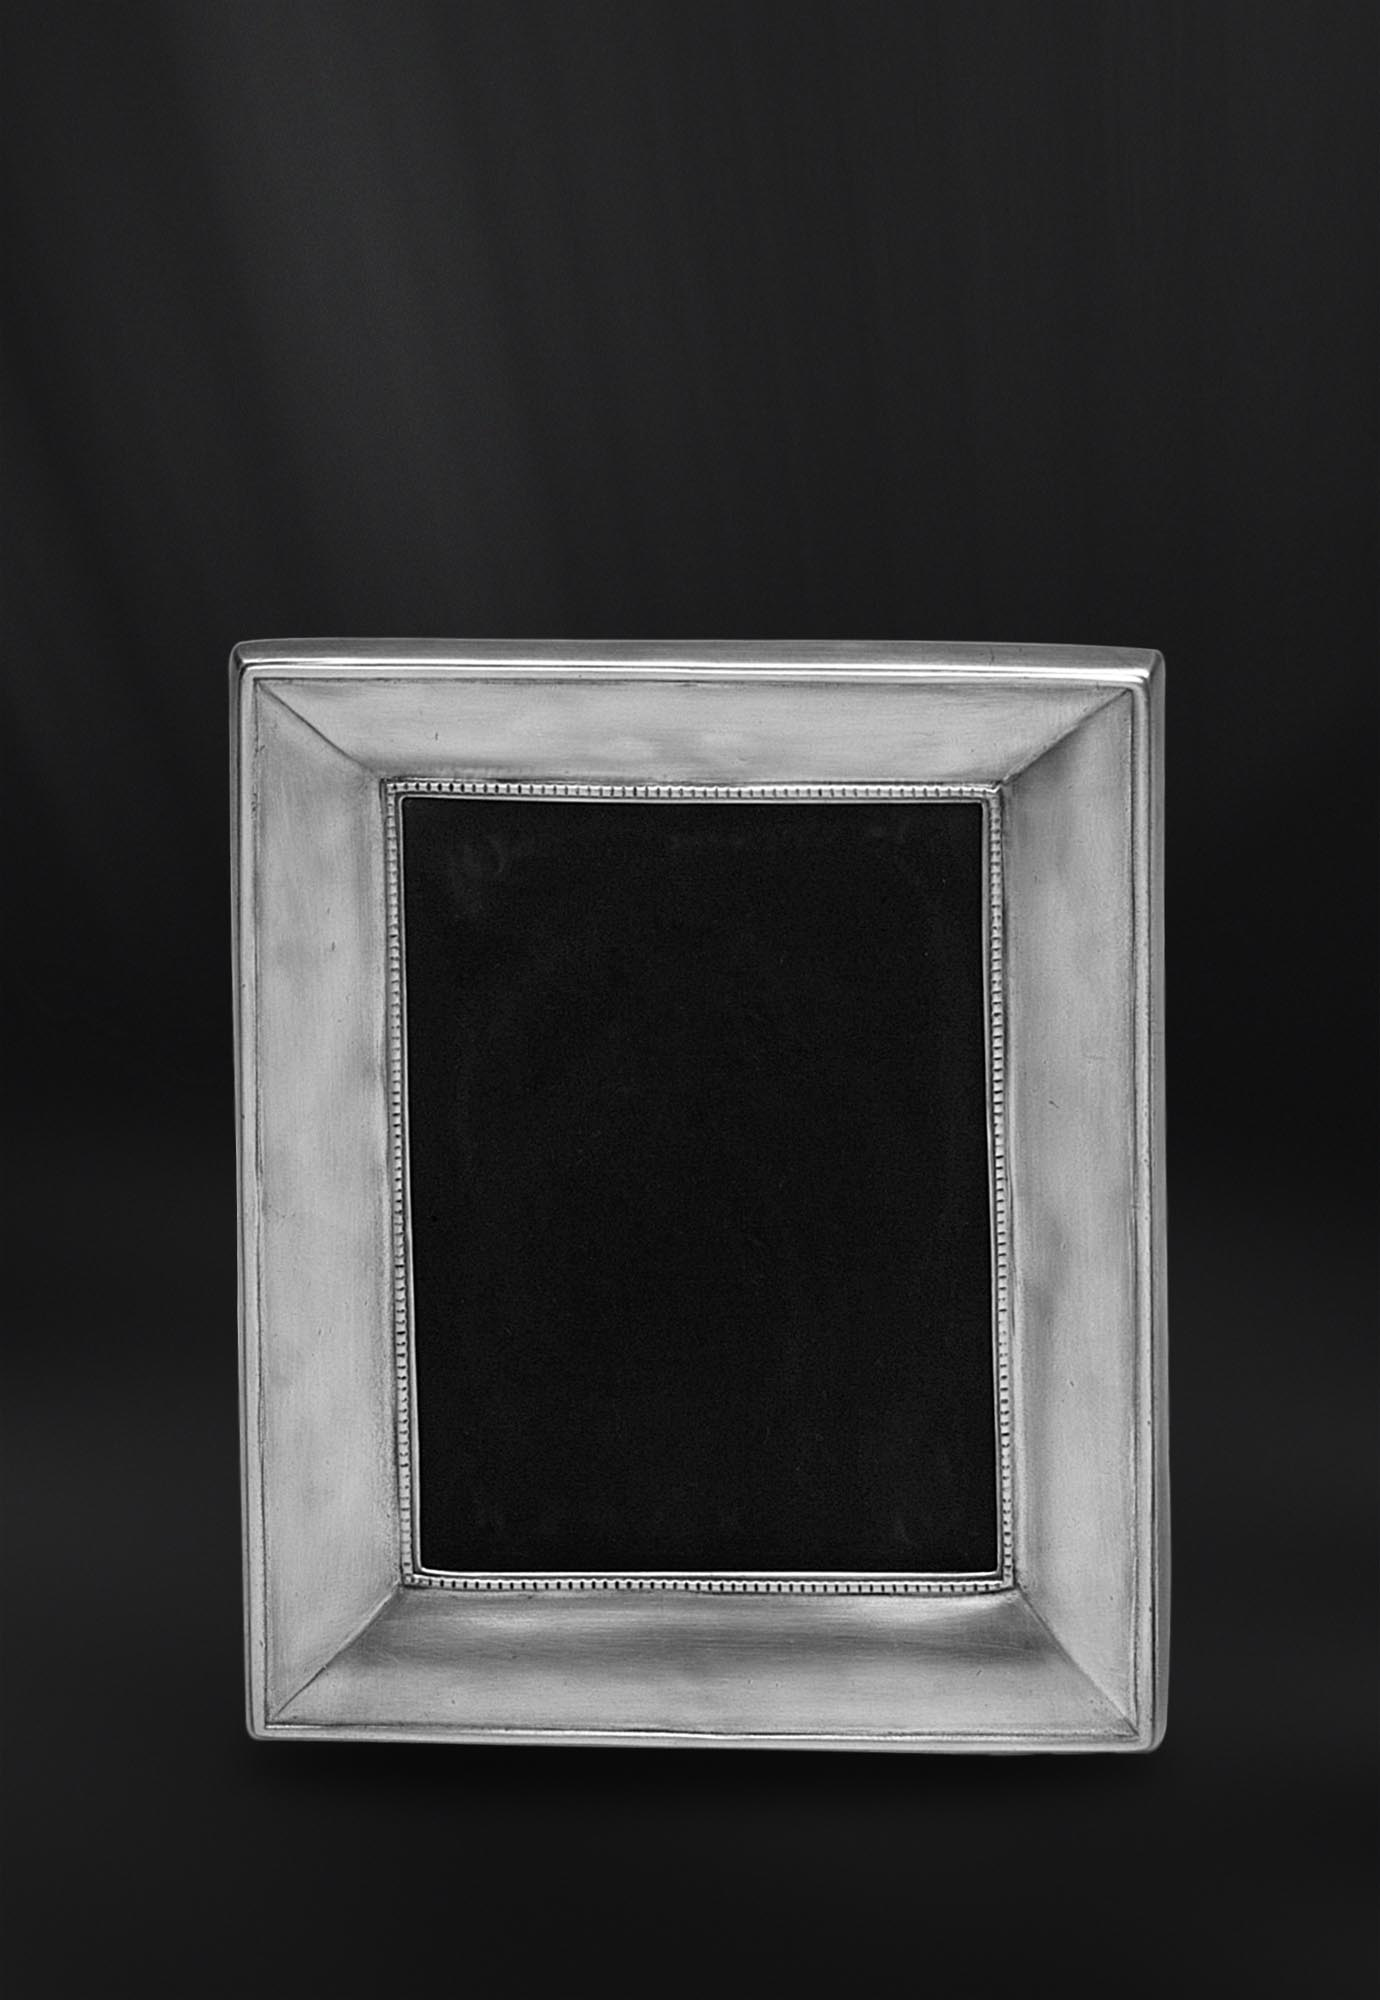 Rechteckiger Bilderrahmen aus Zinn 10x15 - La Bottega del Peltro